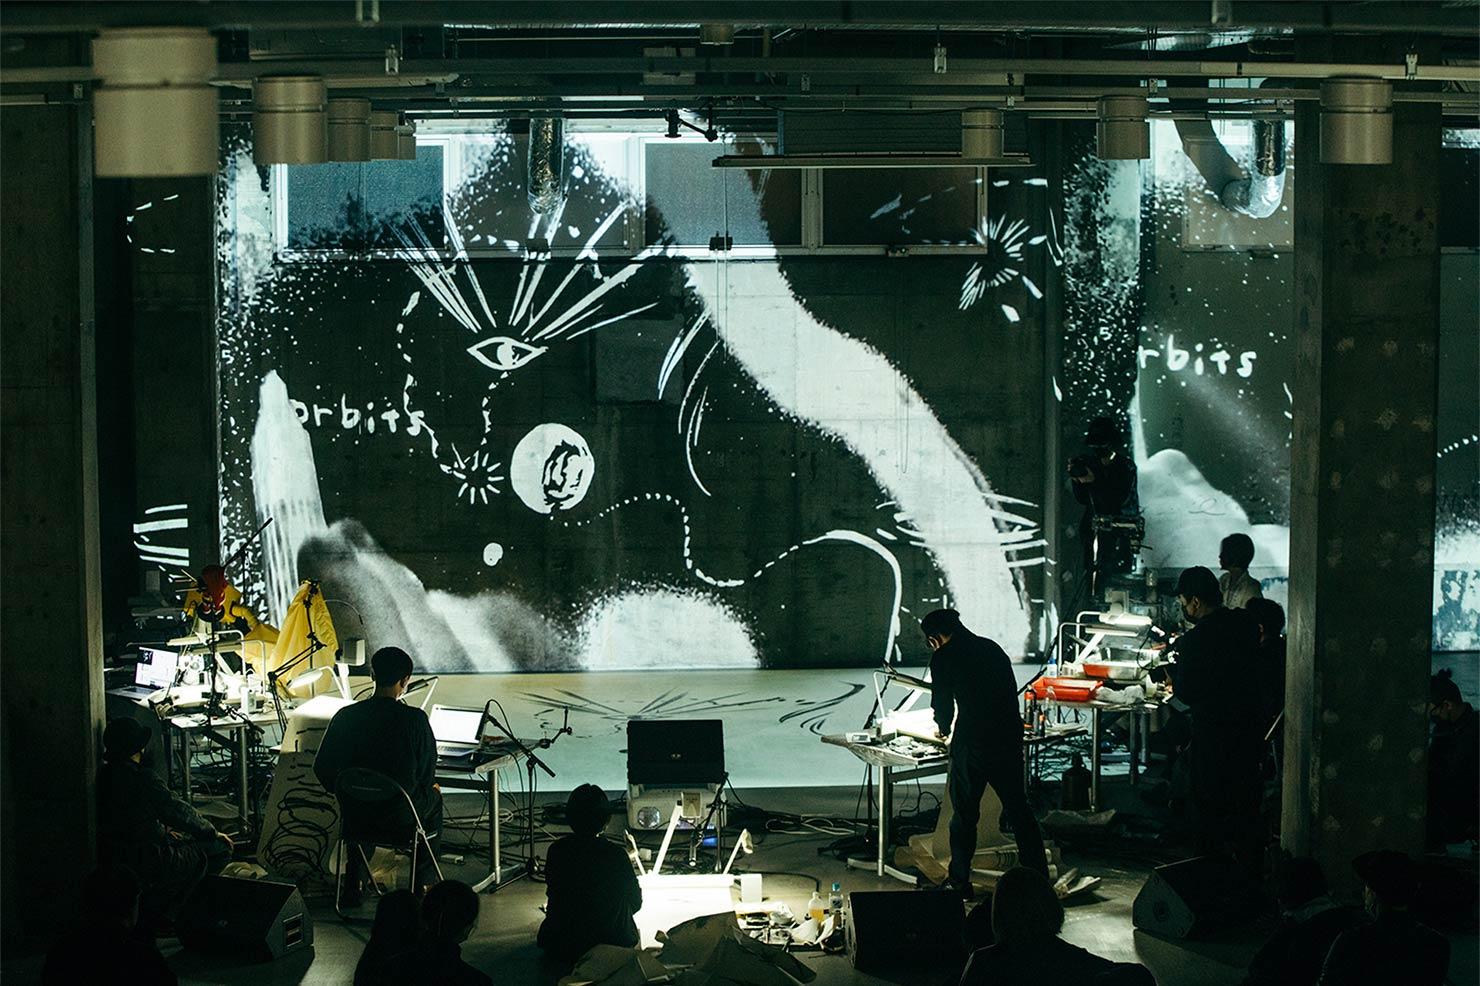 TOKYO CANAL LINKS「ドローイング・オーケストラ/Drawing Orchestra featuring Abdelkader Benchamma」